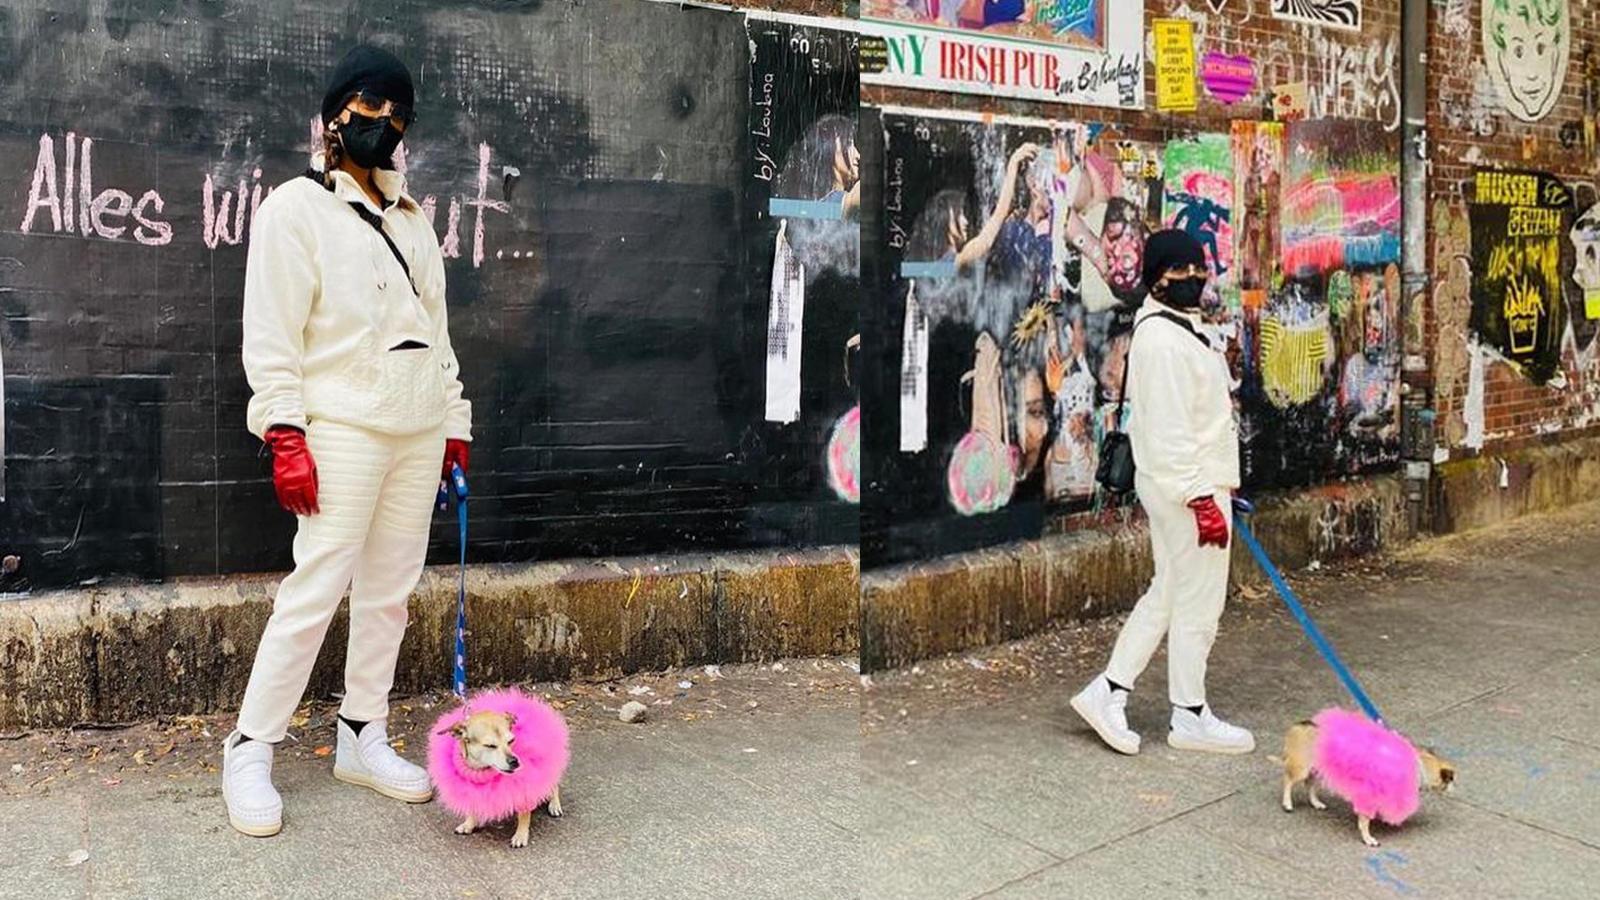 priyanka-chopra-jonas-enjoys-walking-on-german-streets-with-her-pet-pooch-diana-says-everything-will-be-ok